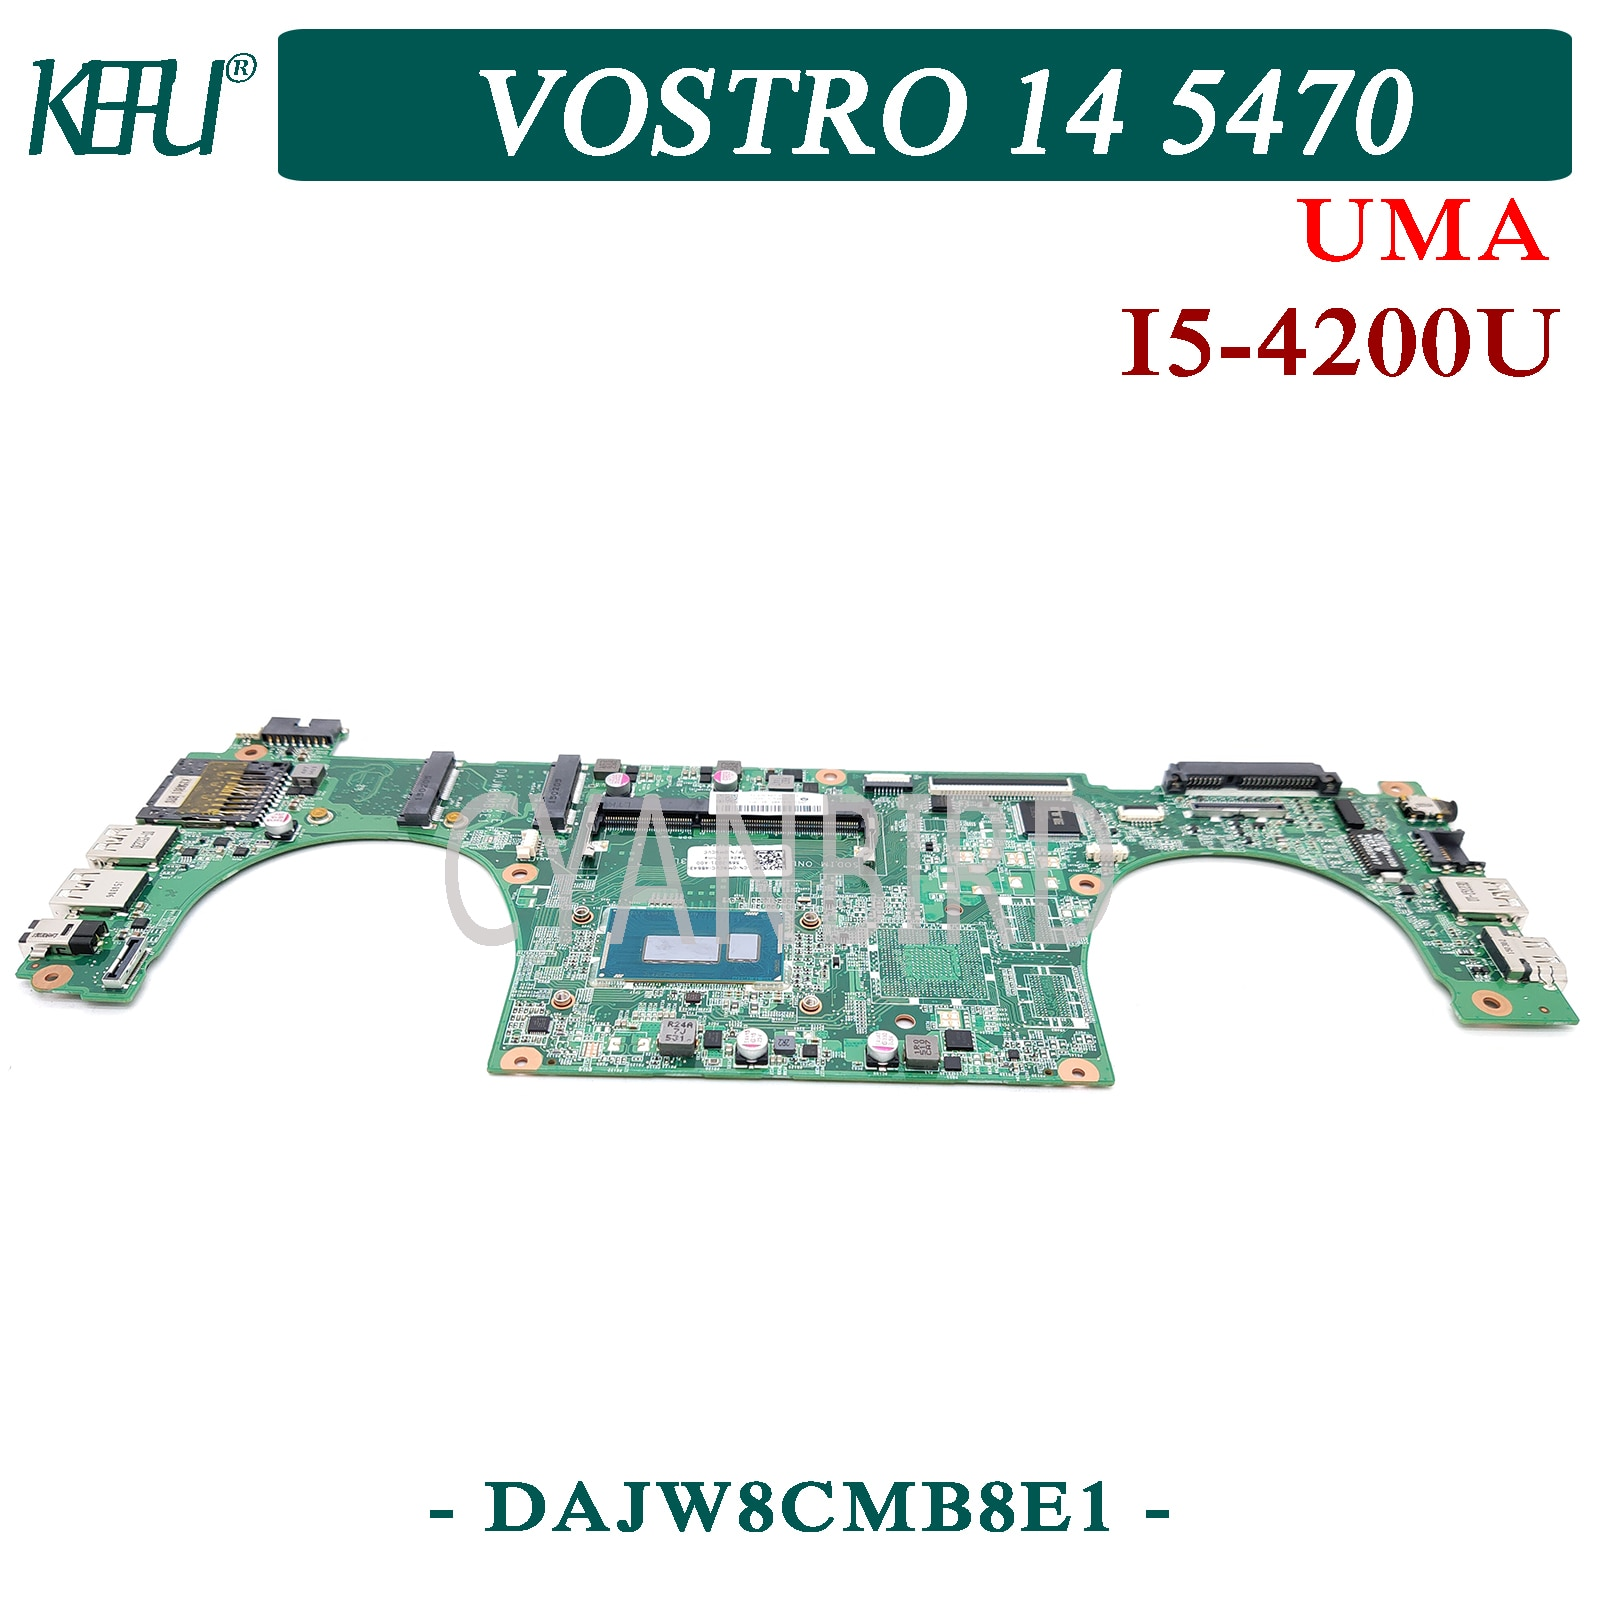 KEFU DAJW8CMB8E1 اللوحة الرئيسية الأصلية لديل Vostro 14-5470 UMA DDR3L مع I5-4200U اللوحة الأم للكمبيوتر المحمول